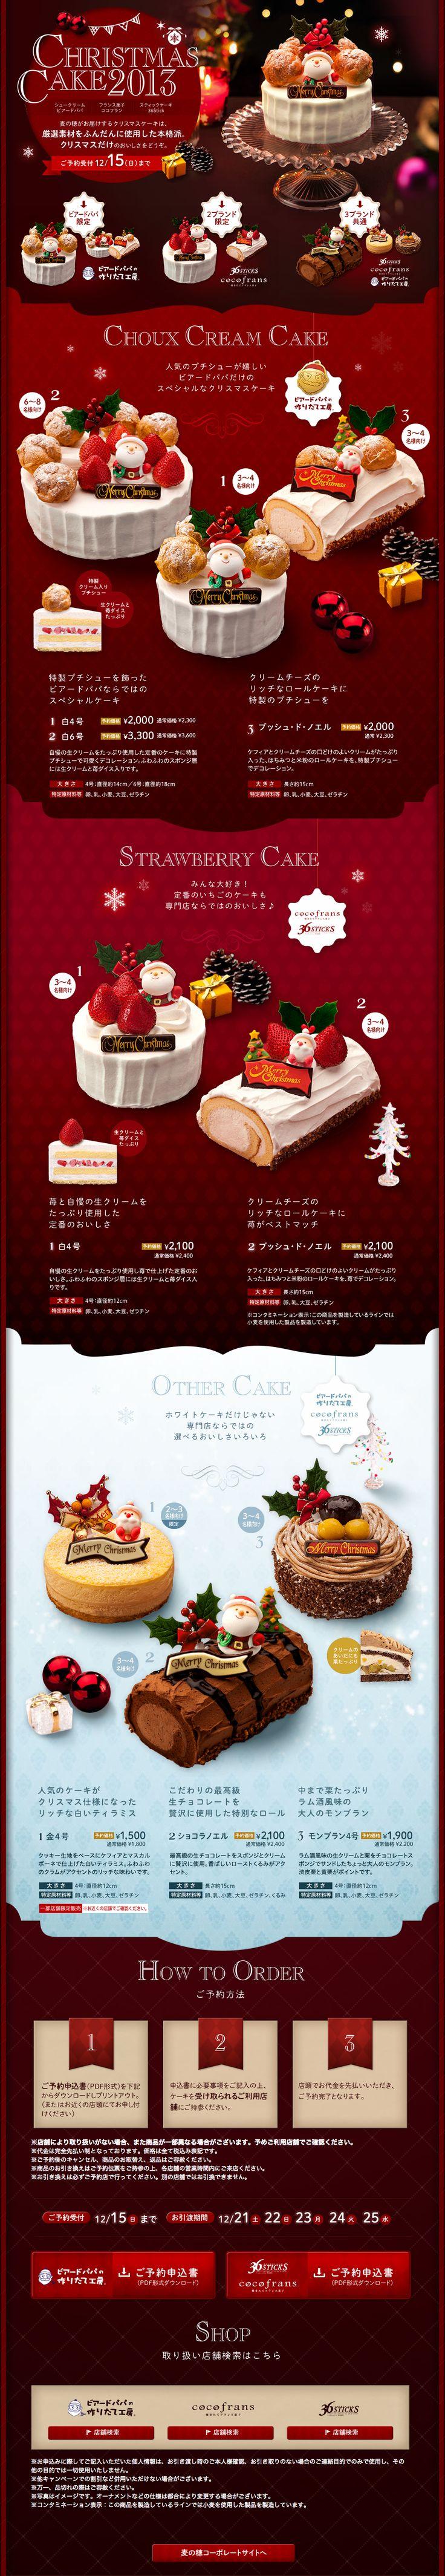 web design | muginoho.com Christmas Cakes 特集ページ #japan #japanese